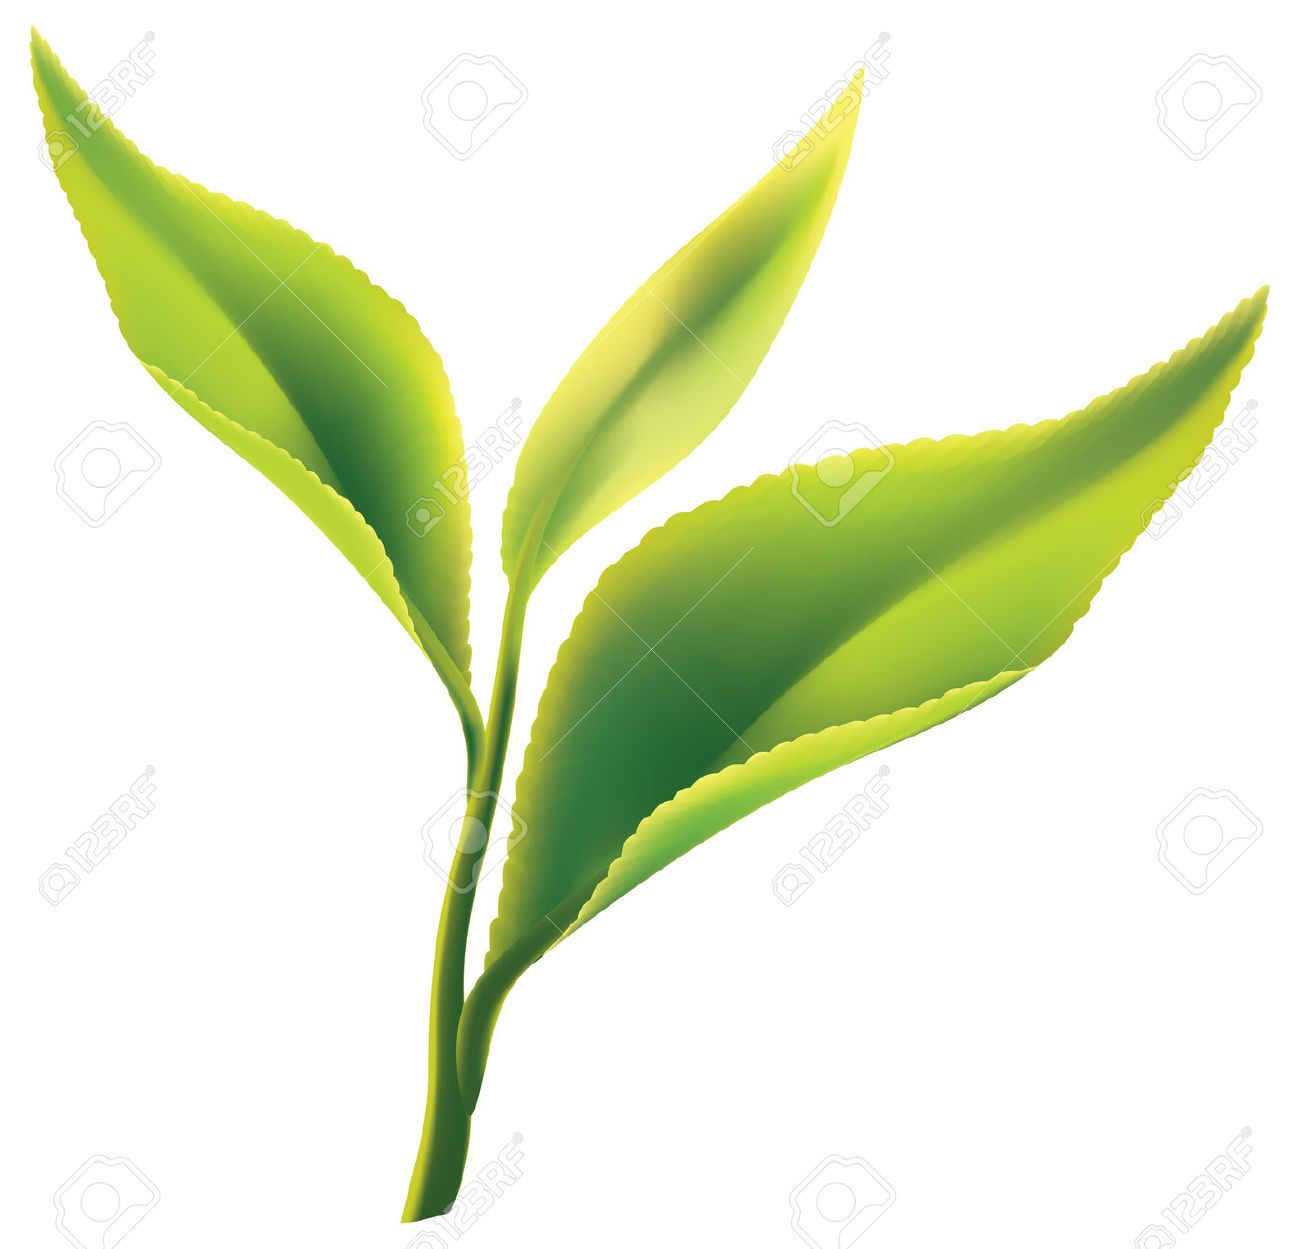 Tea leaves clipart